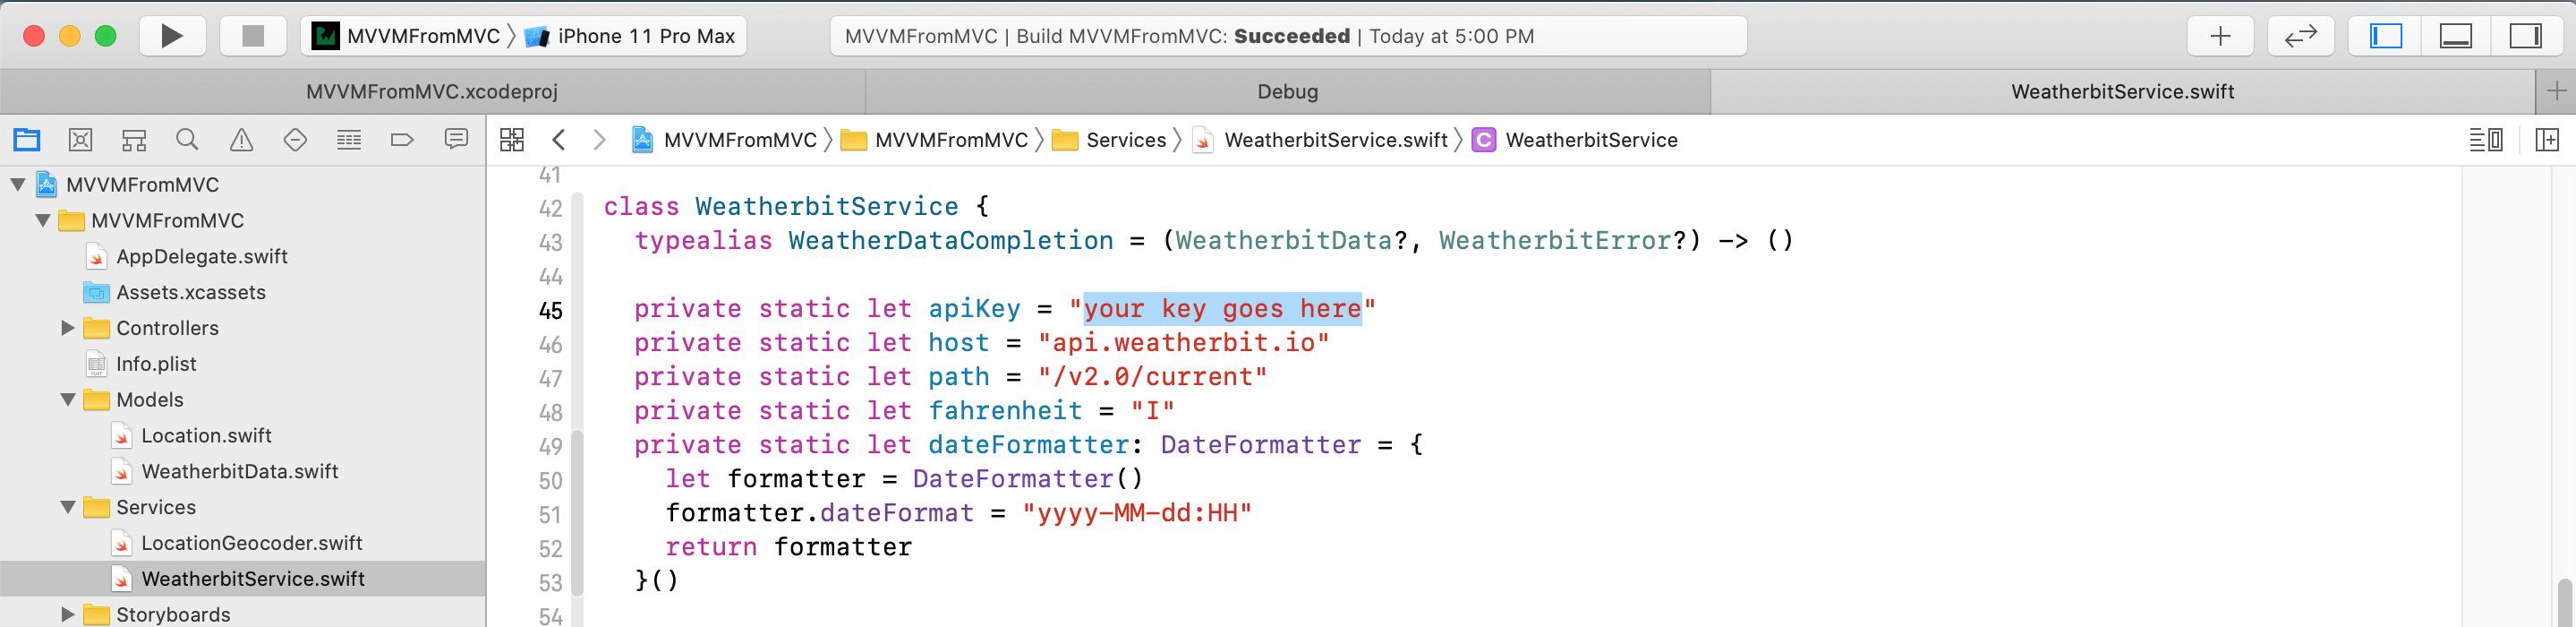 Image showing where to add Weatherbit API Key